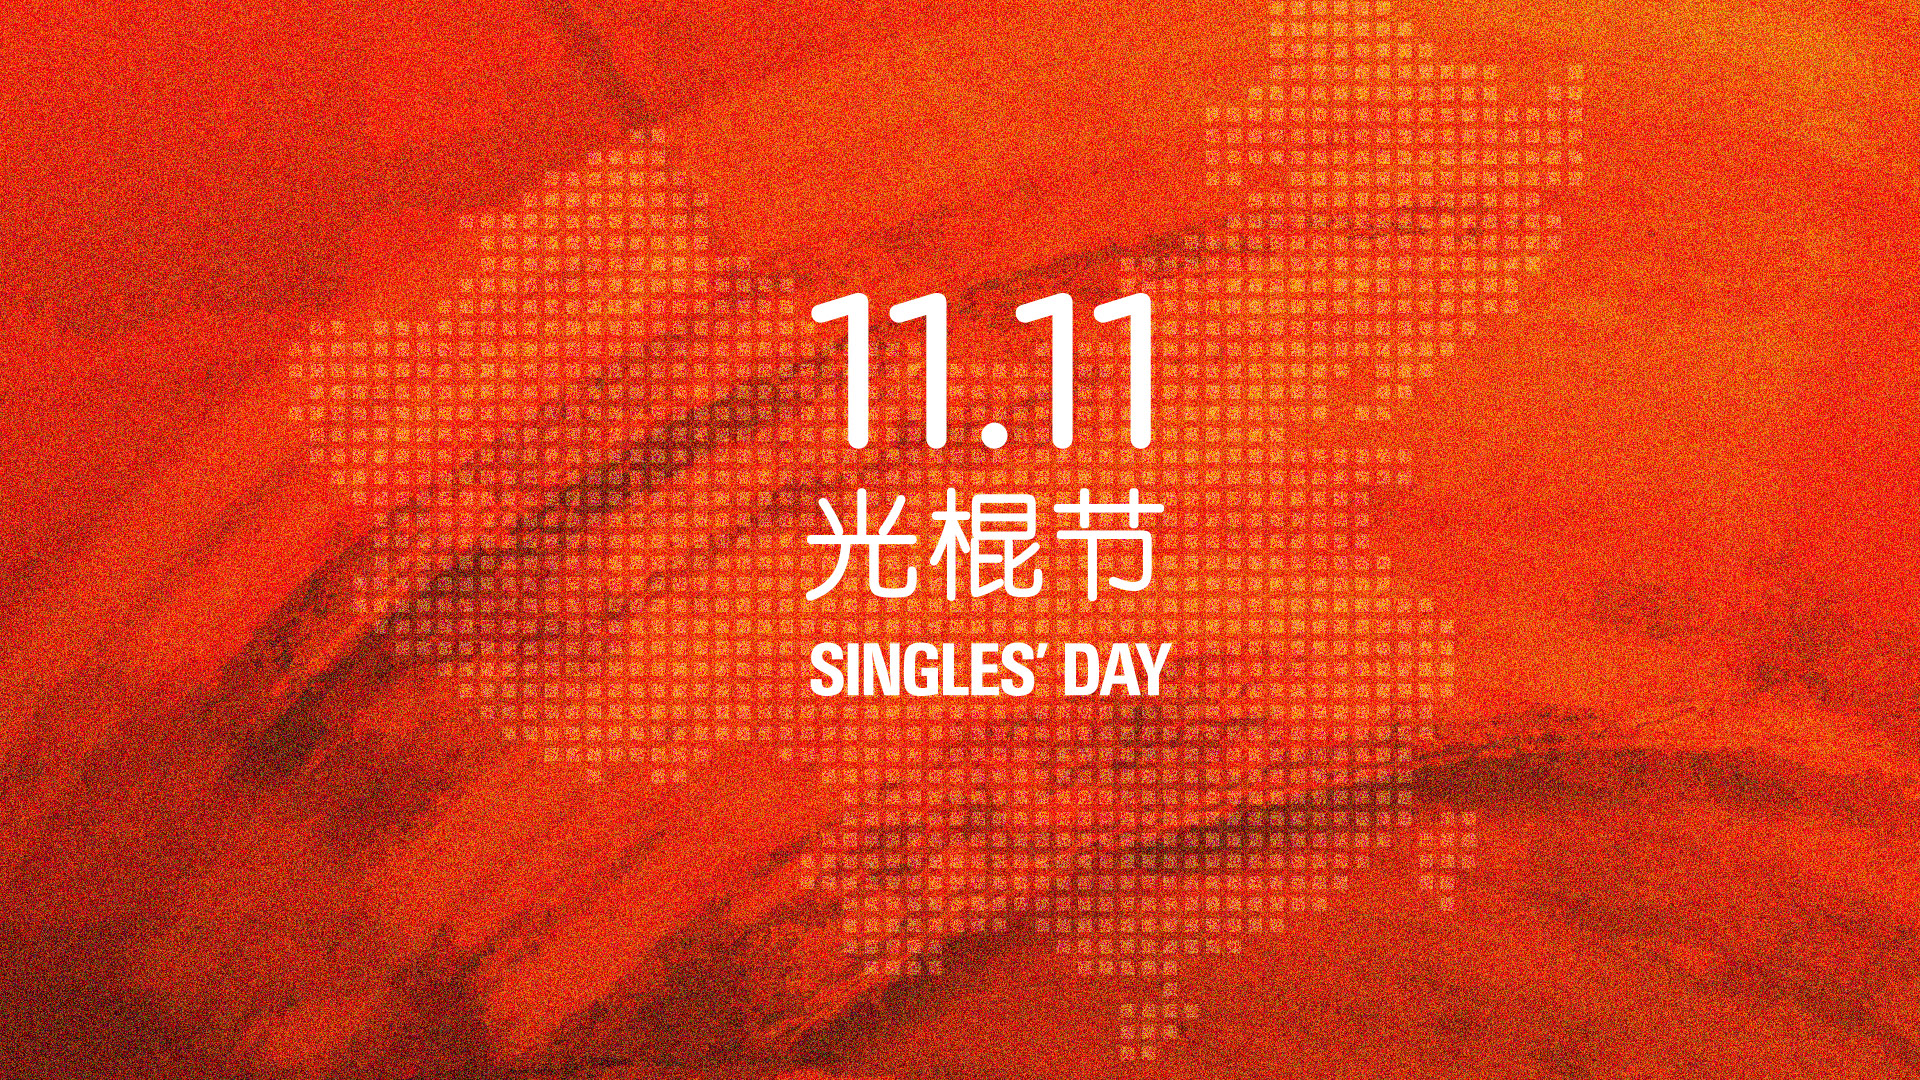 singlesday1